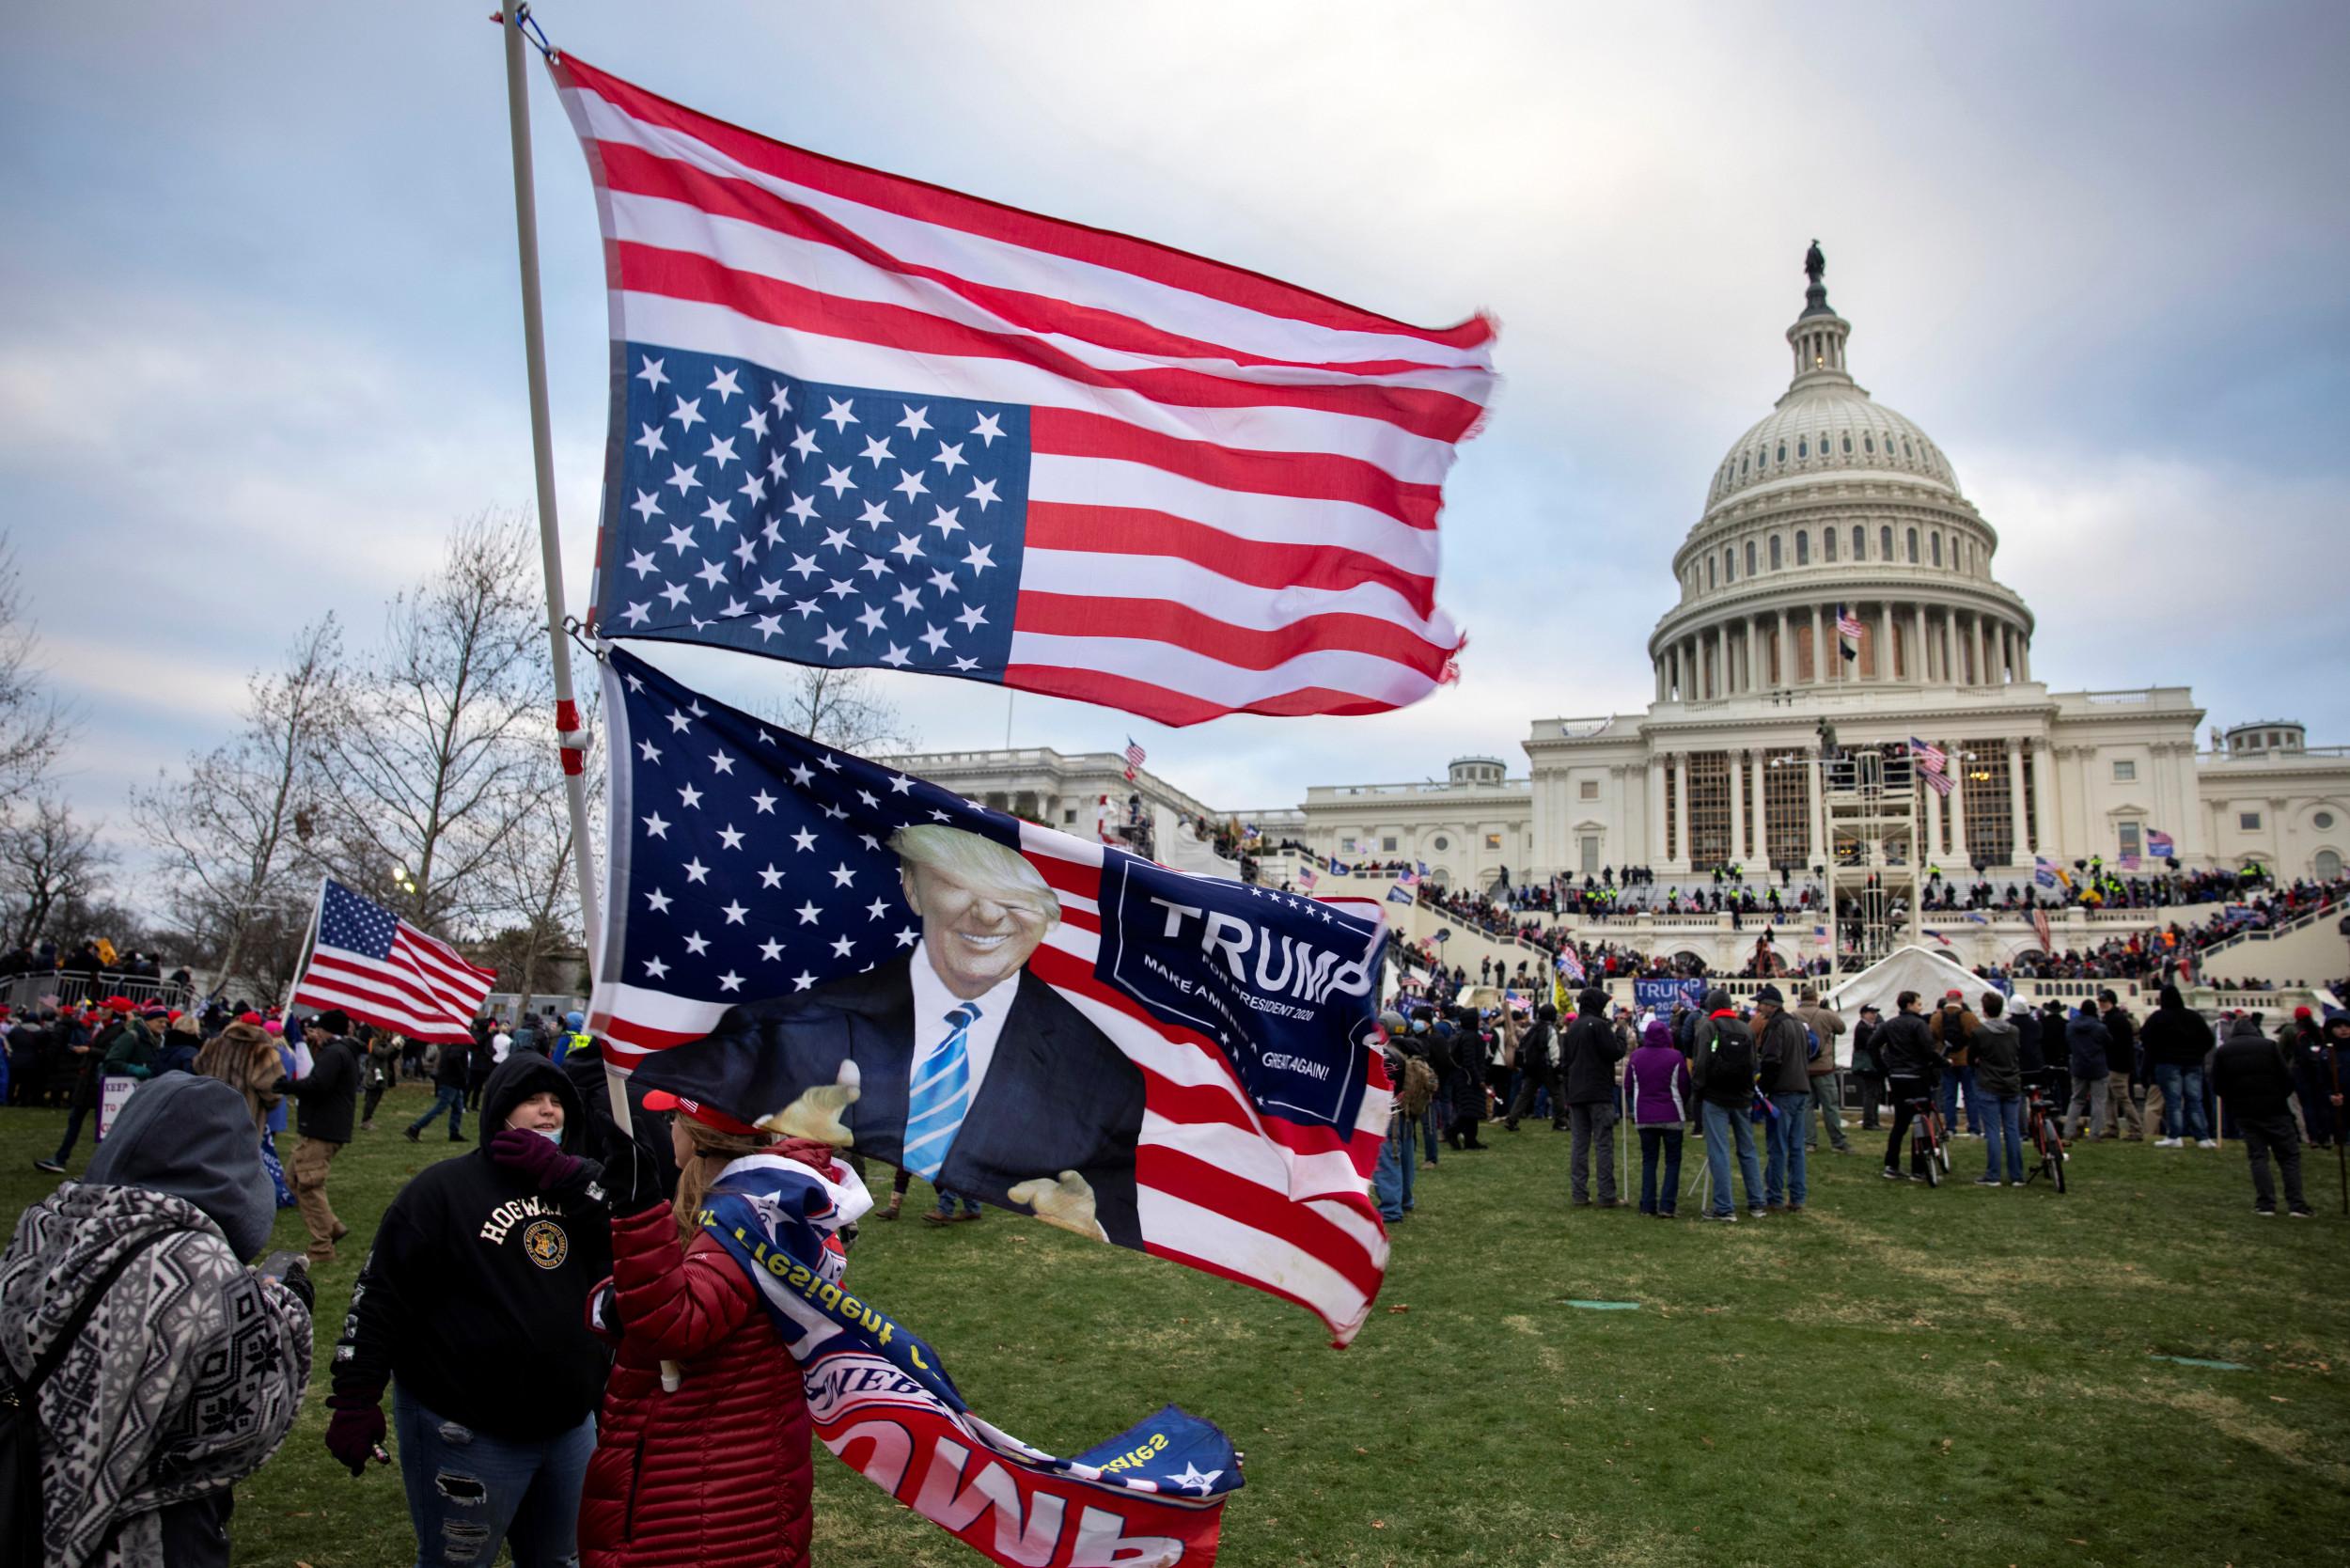 Alexandria Ocasio-Cortez Says House GOP Has 'Legitimate White Supremacist Sympathizers'